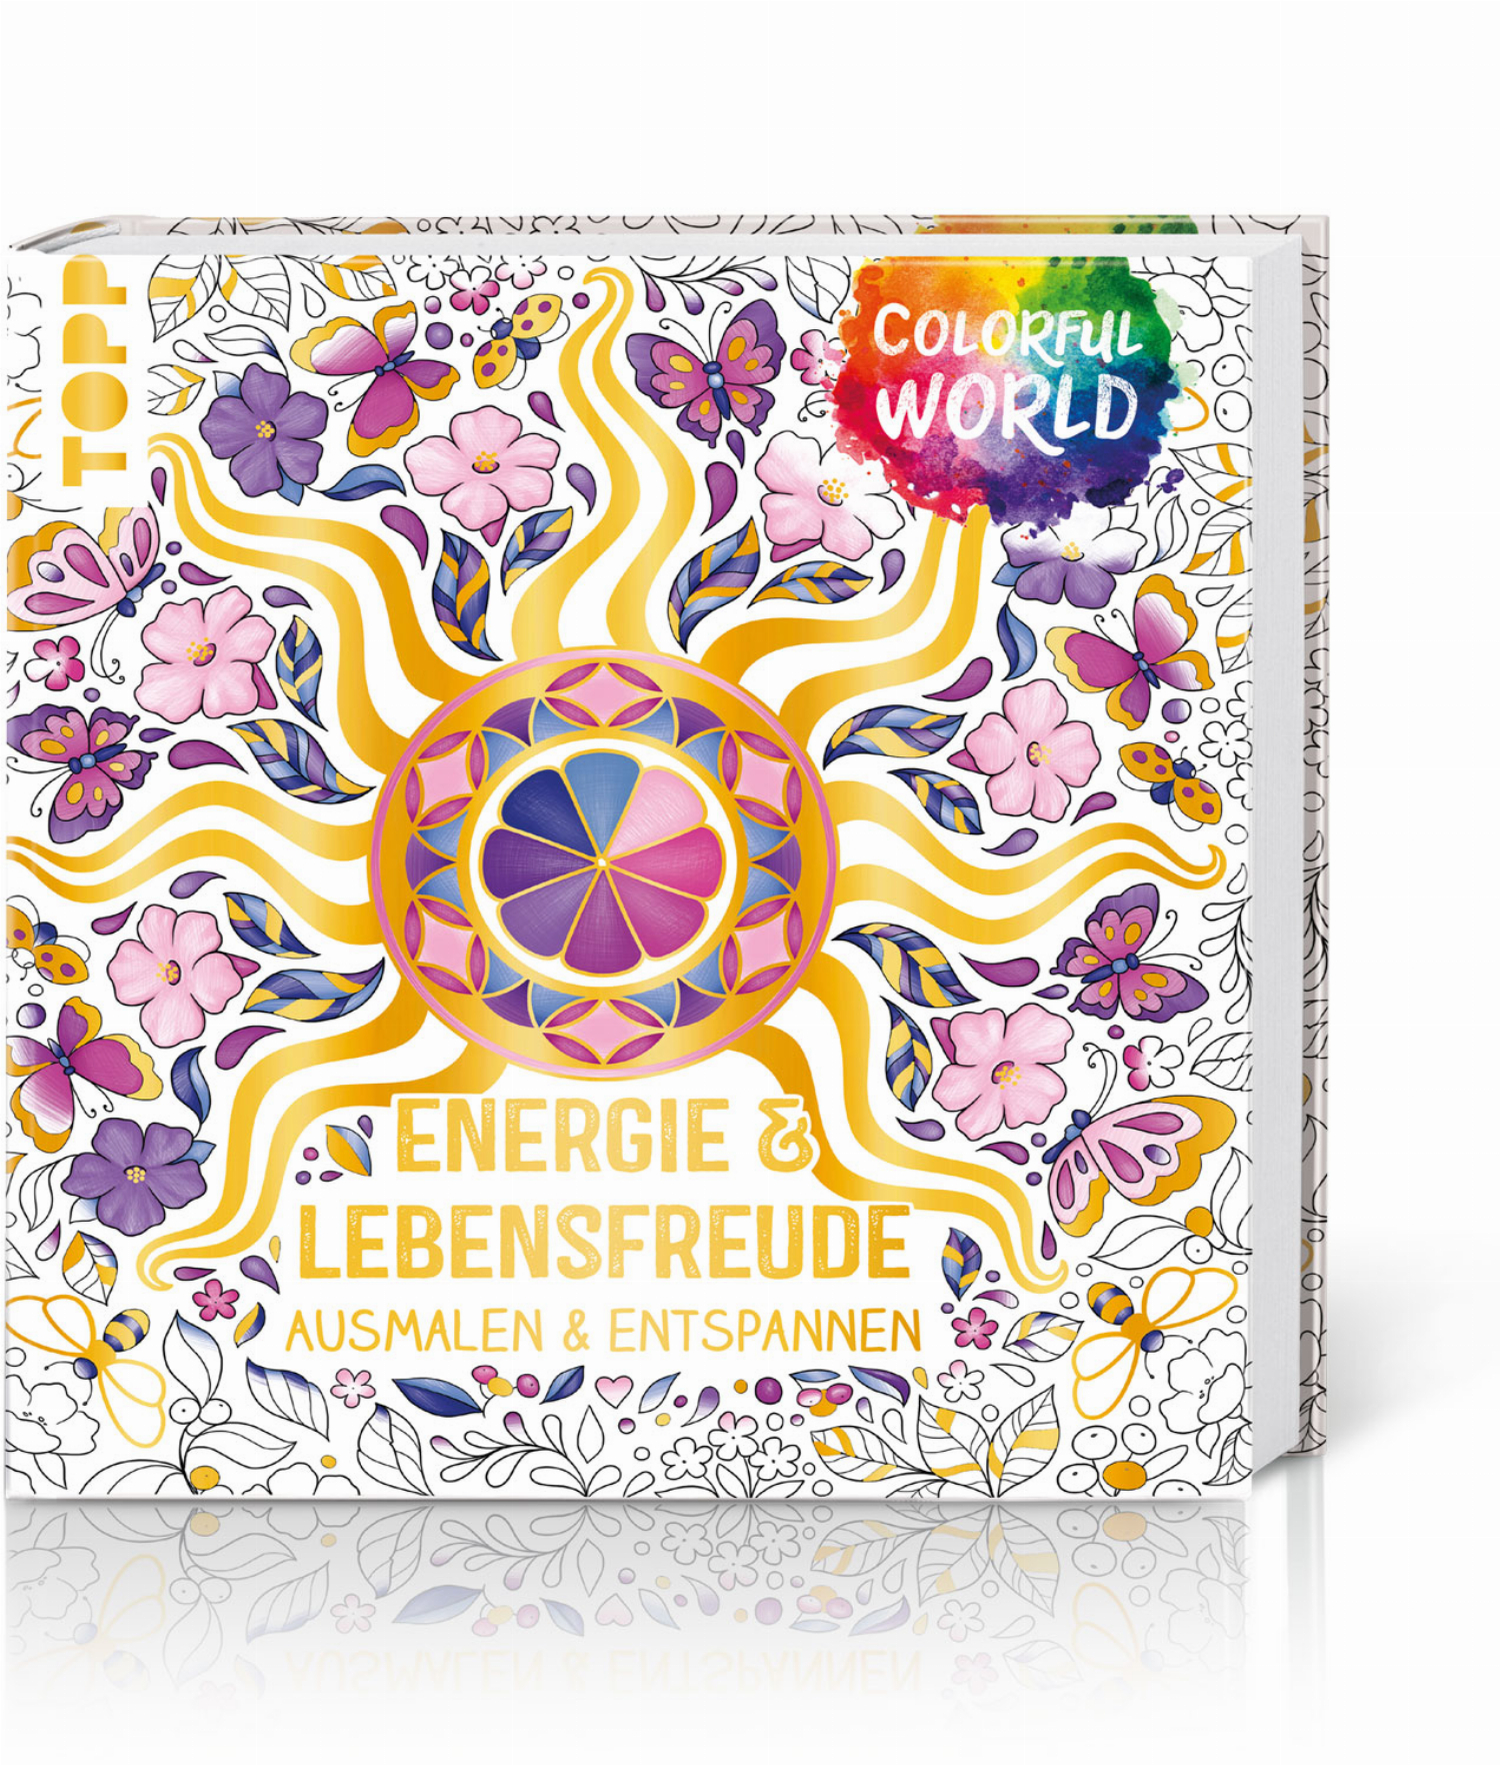 Colorful World – Energie & Lebensfreude, Produktbild 1